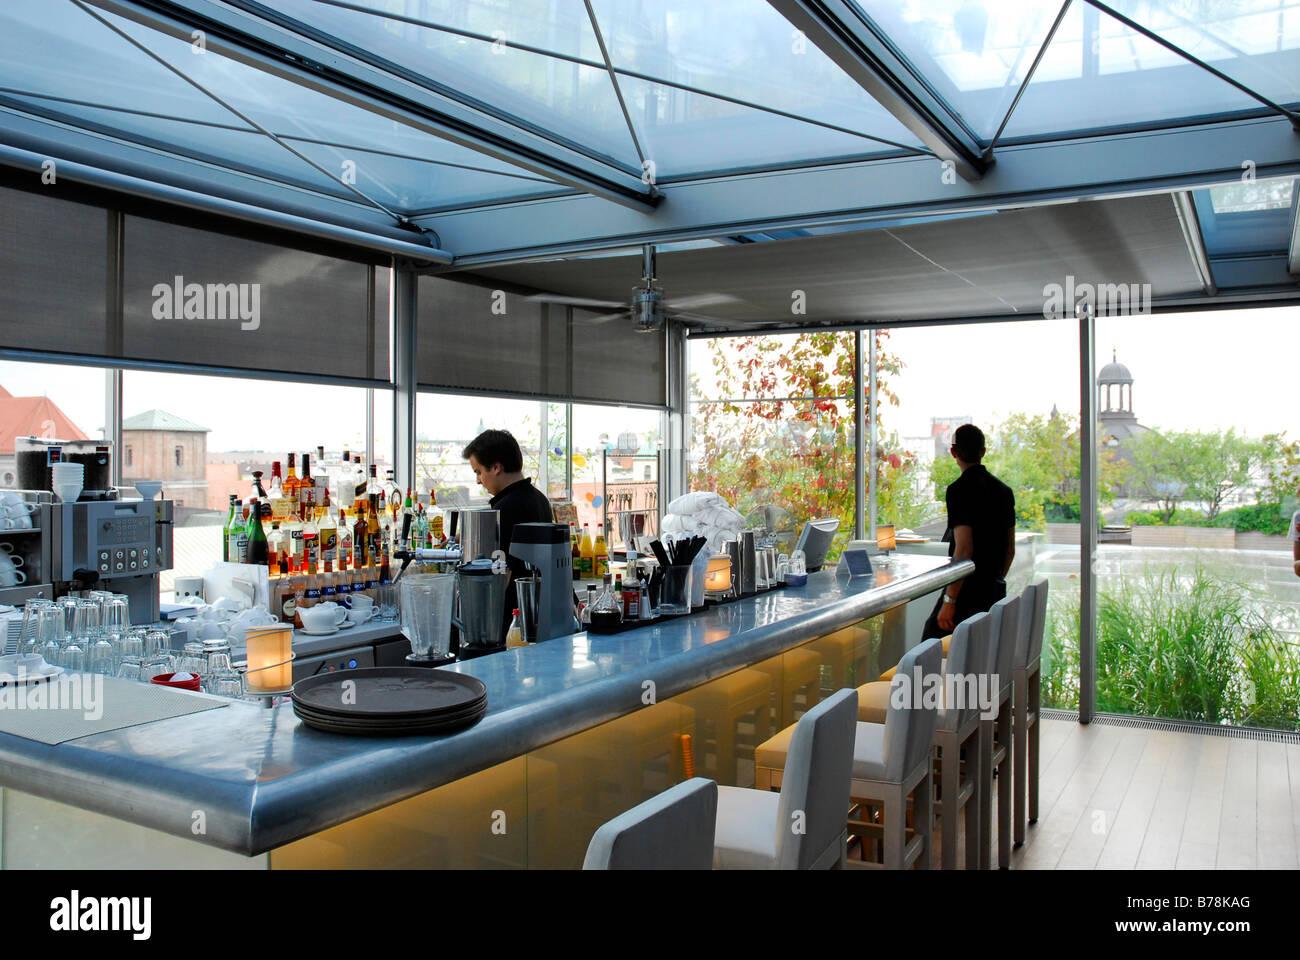 Hotel bayerischer hof at promenadeplatz square bar cafe for 211 roof terrace cafe